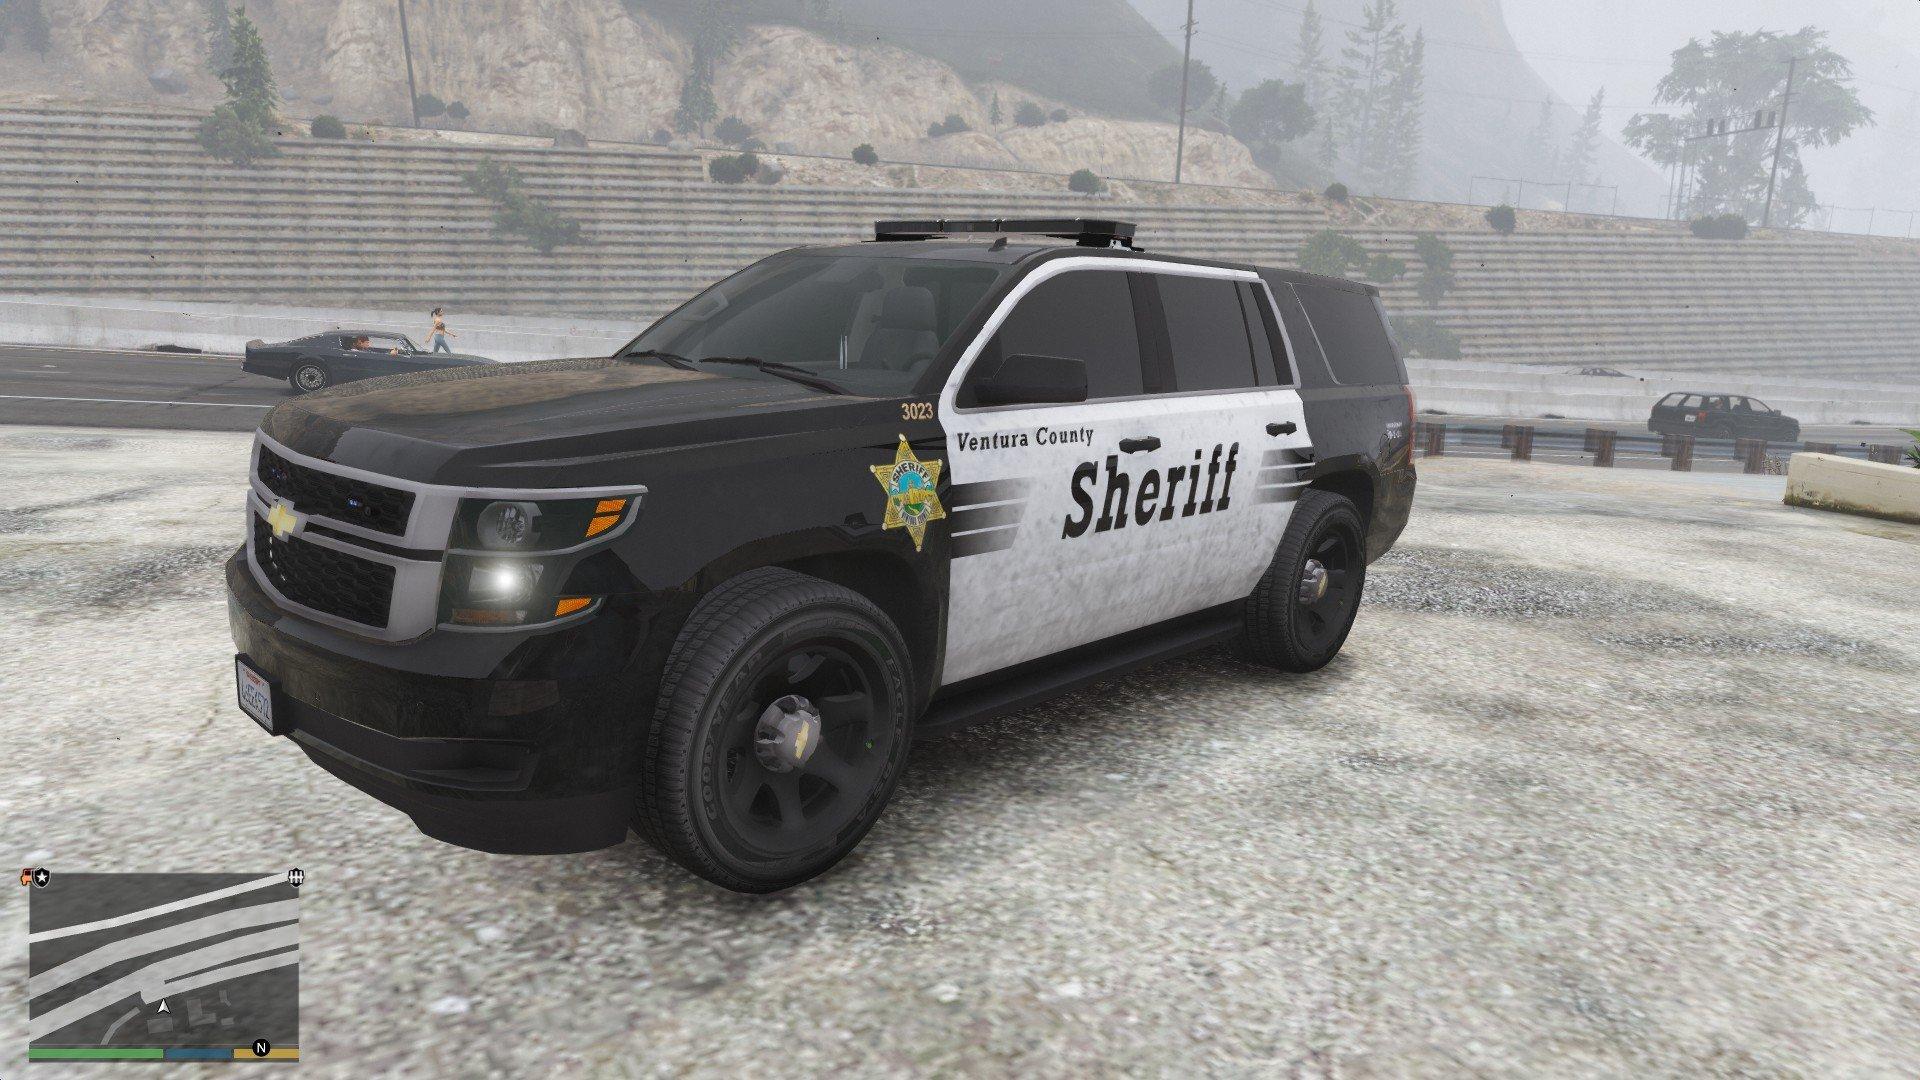 Ventura County Sheriff Department Vcsd Texture Pack 4k Gta5 Mods Com